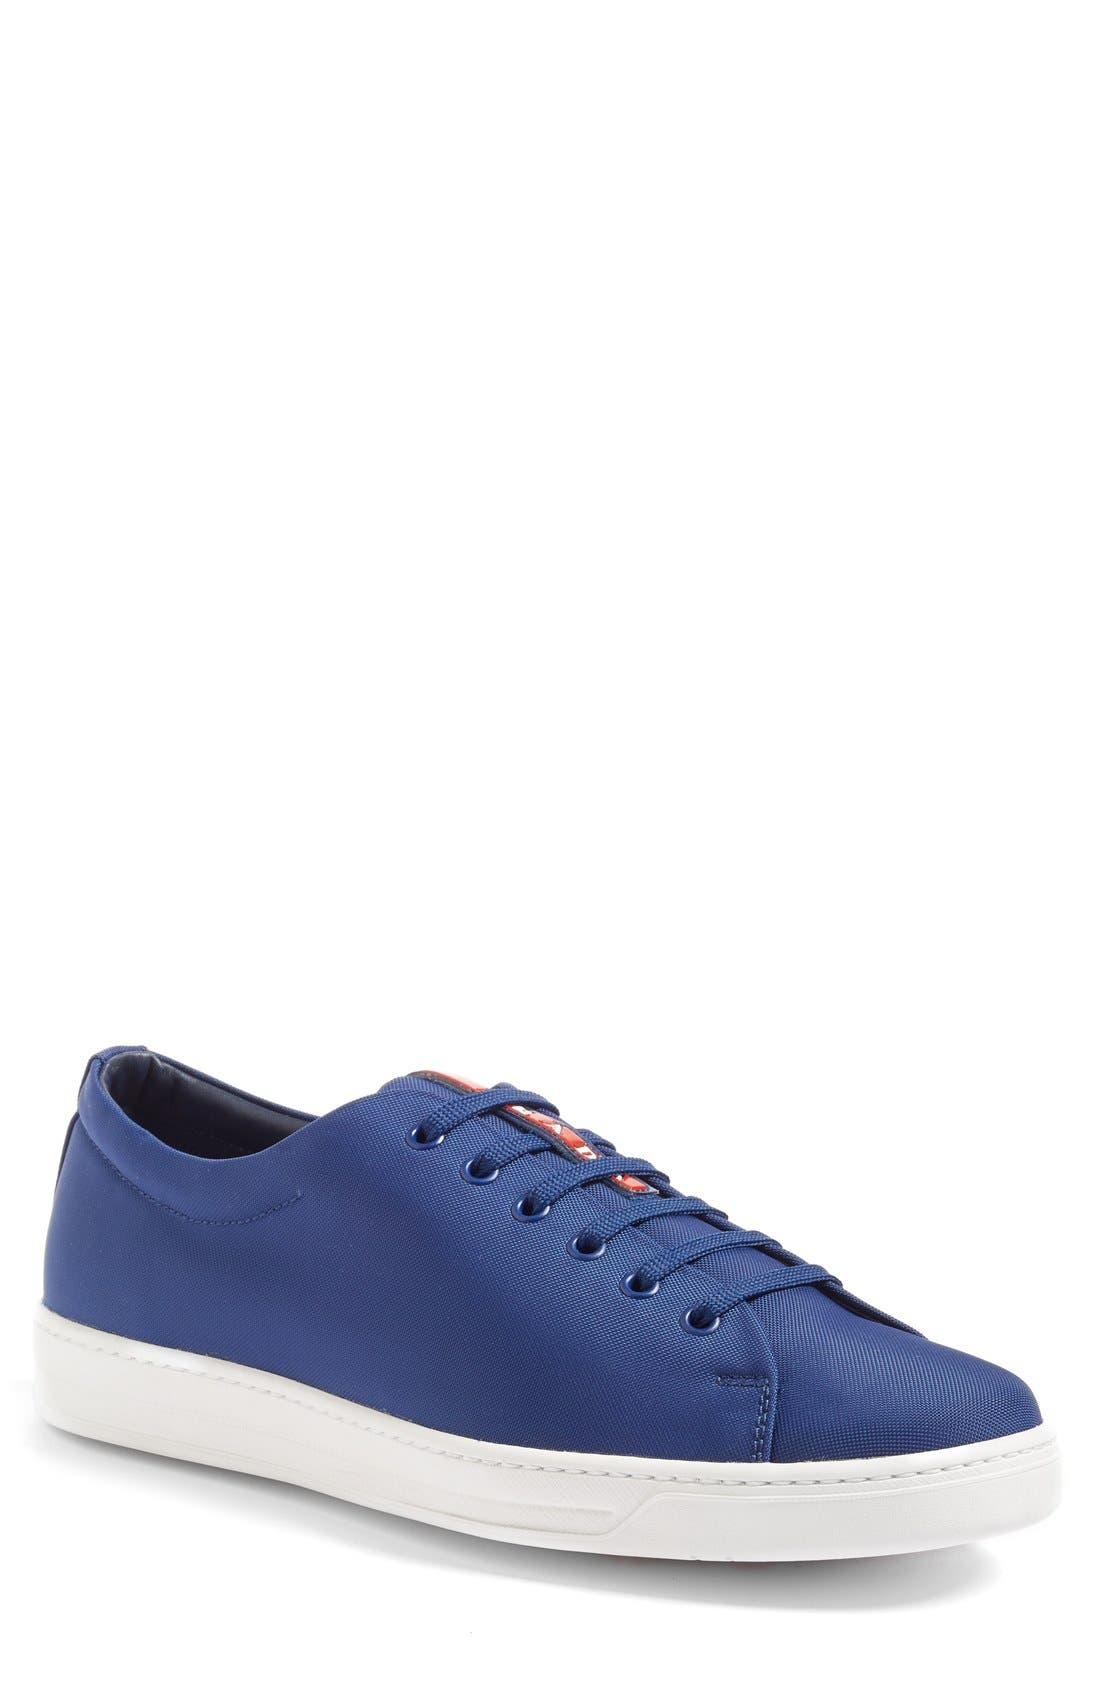 PRADA LINEA ROSSA Low Top Sneaker